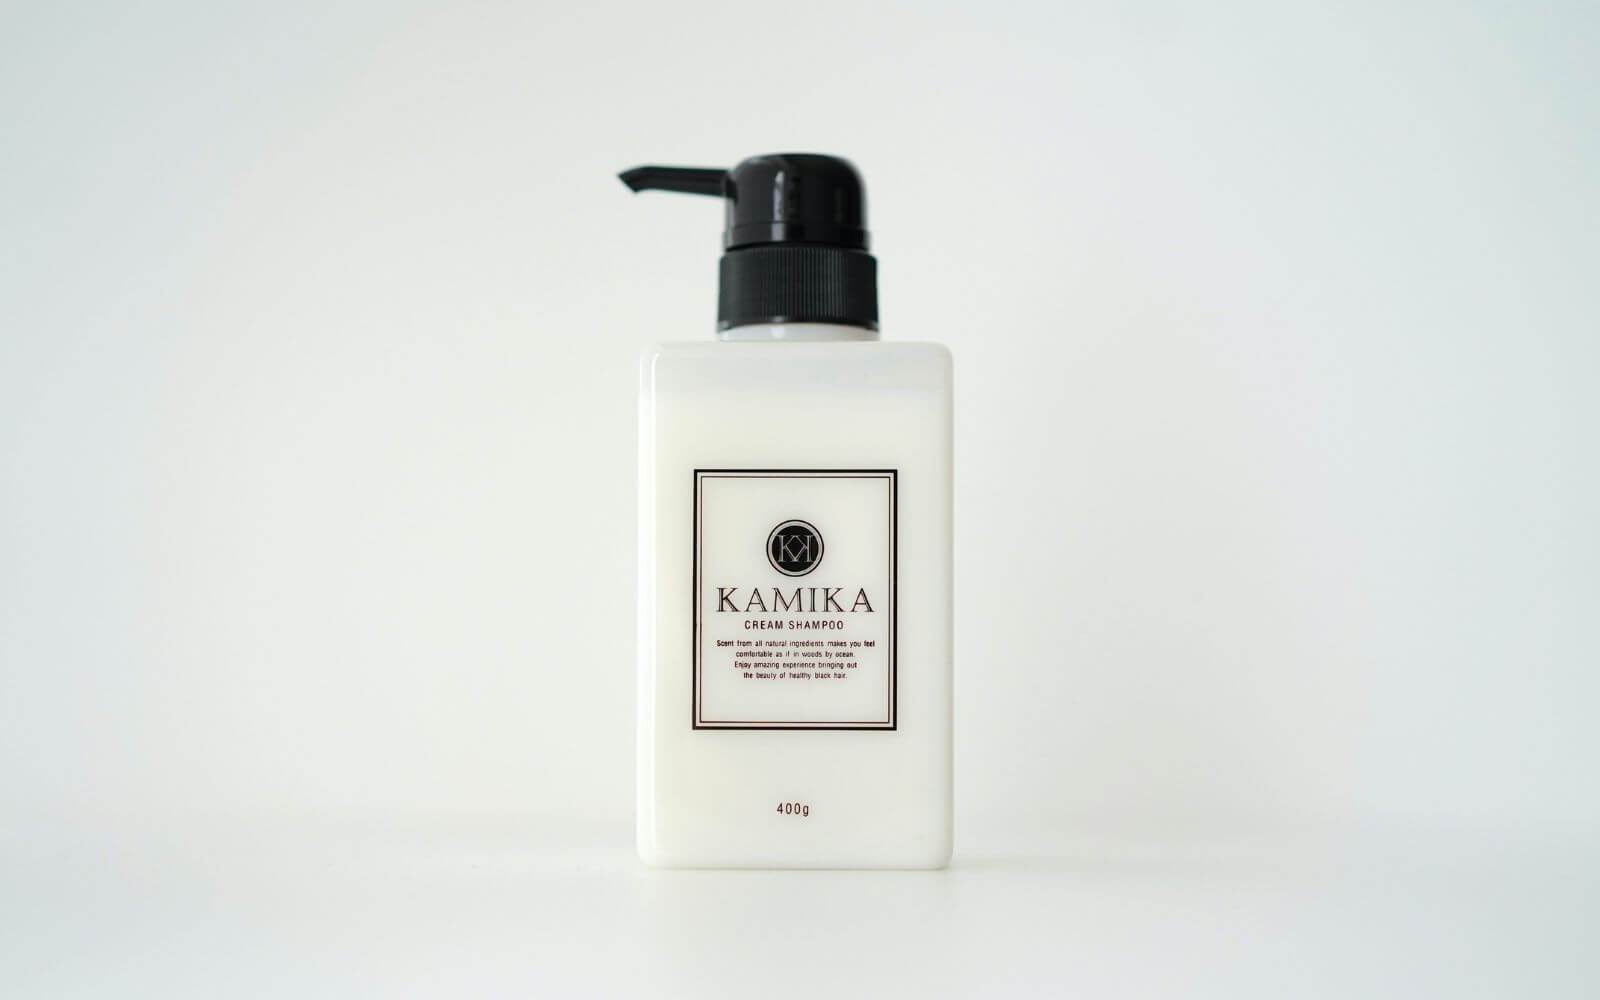 KAMIKA 黒髪クリームシャンプーの基本情報